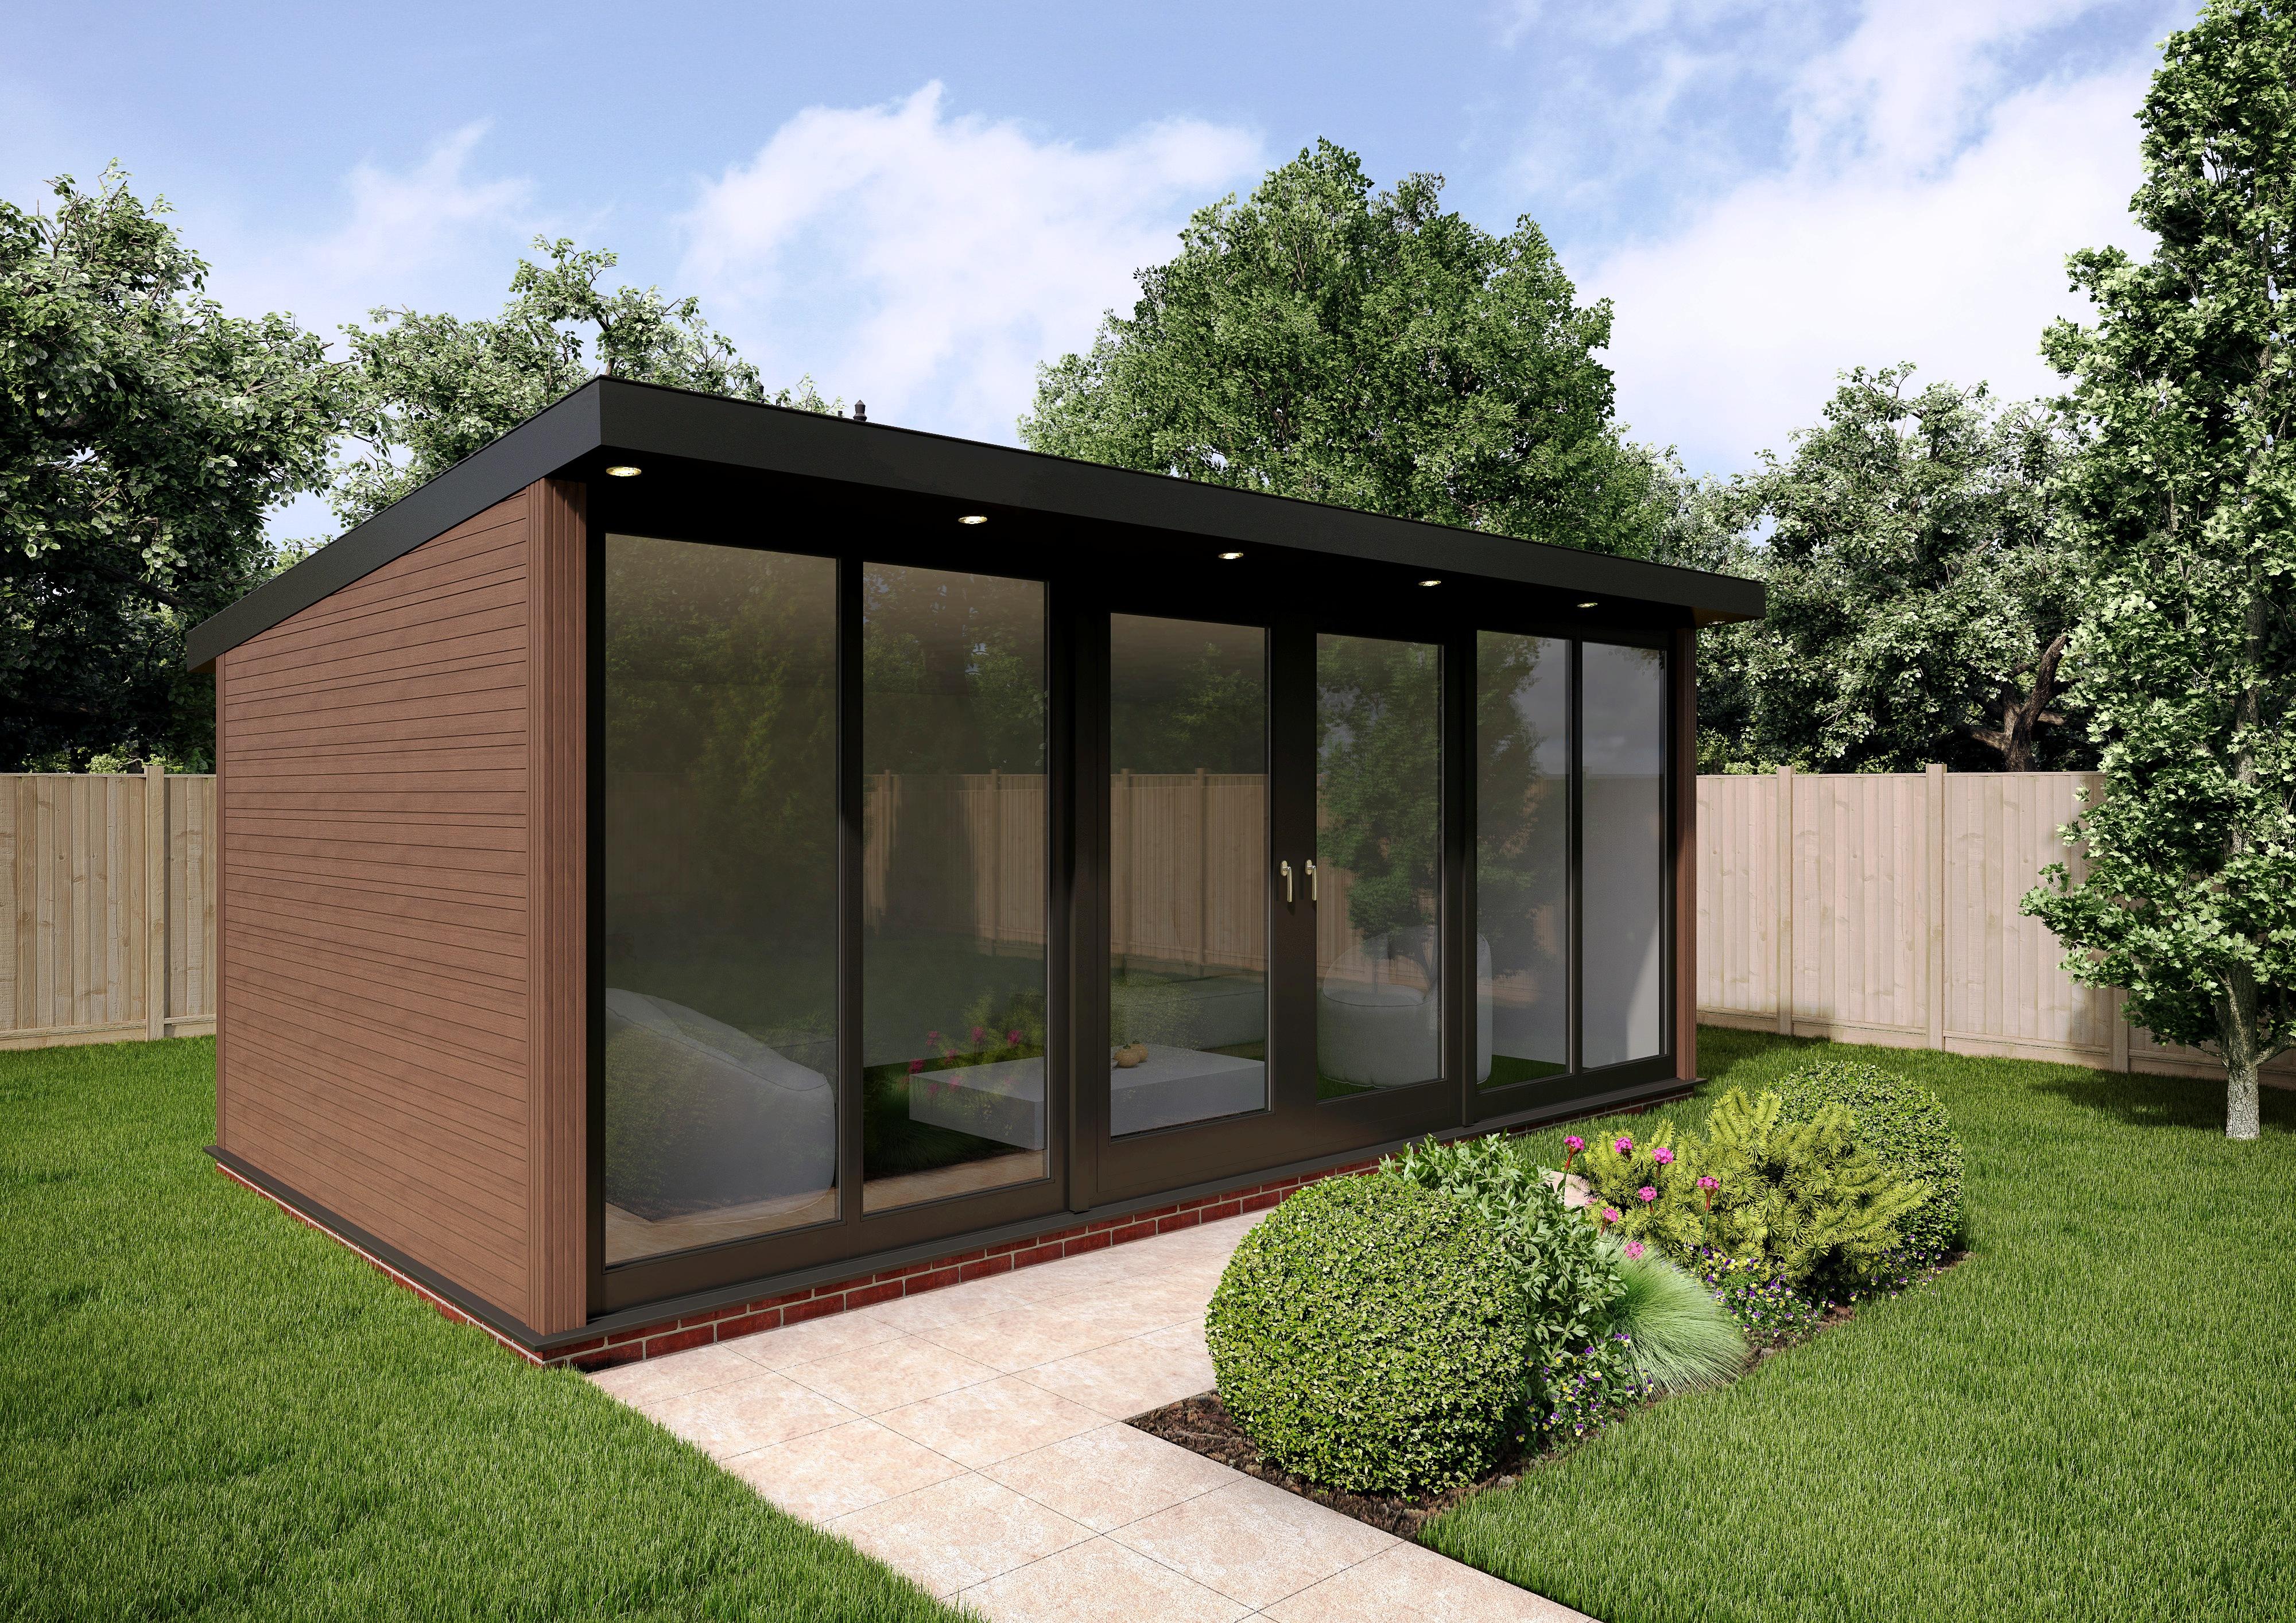 3m x 2.4m sherwood composite garden building QREBMZX